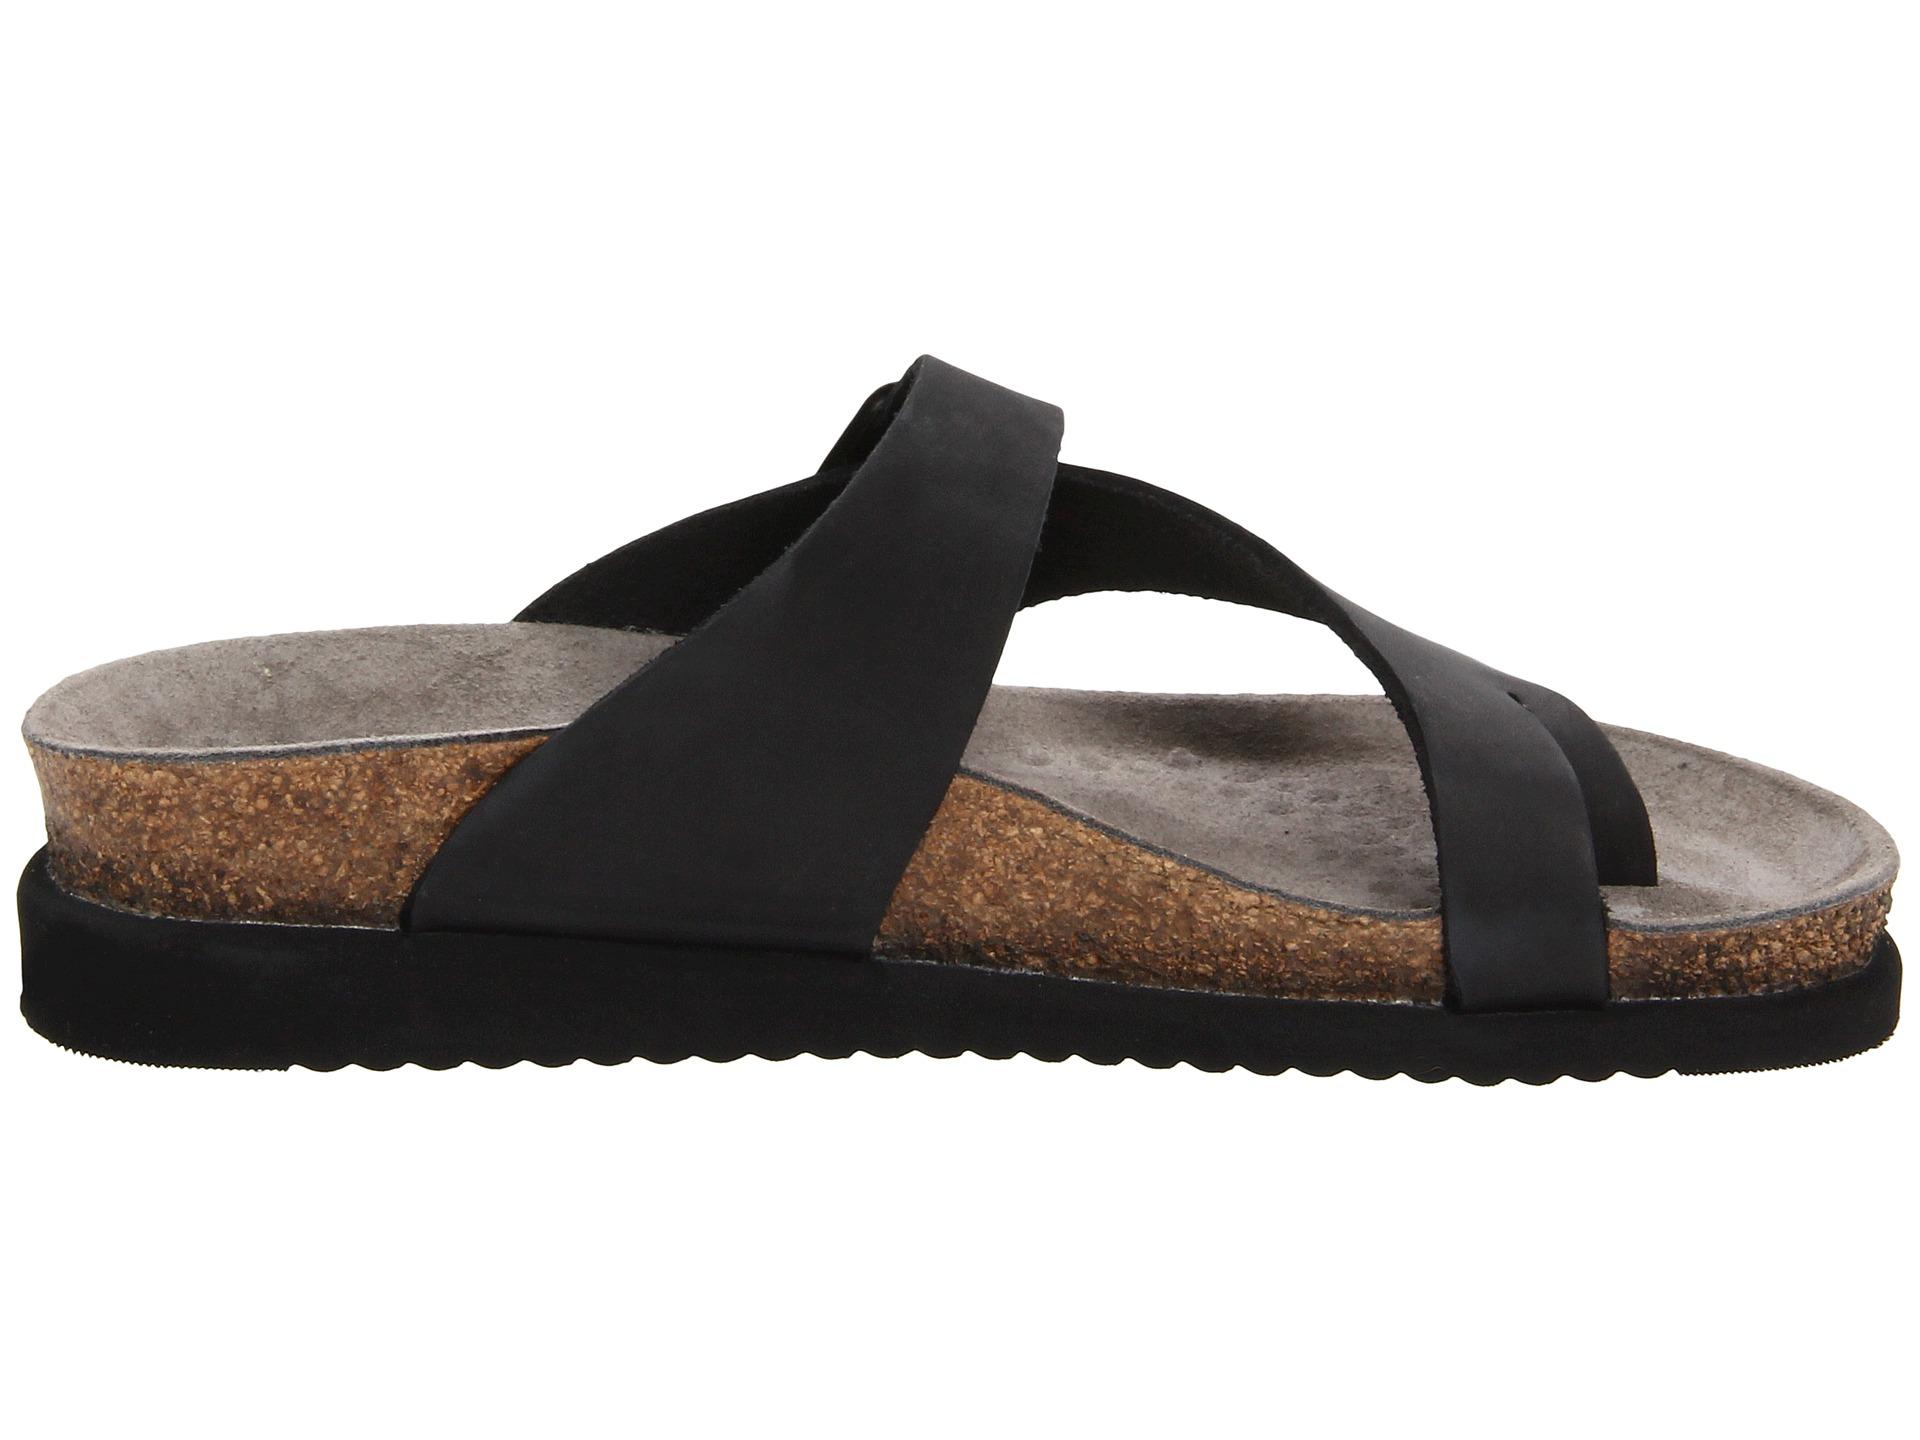 Shoes Mephisto Black Patent Sandals Helen